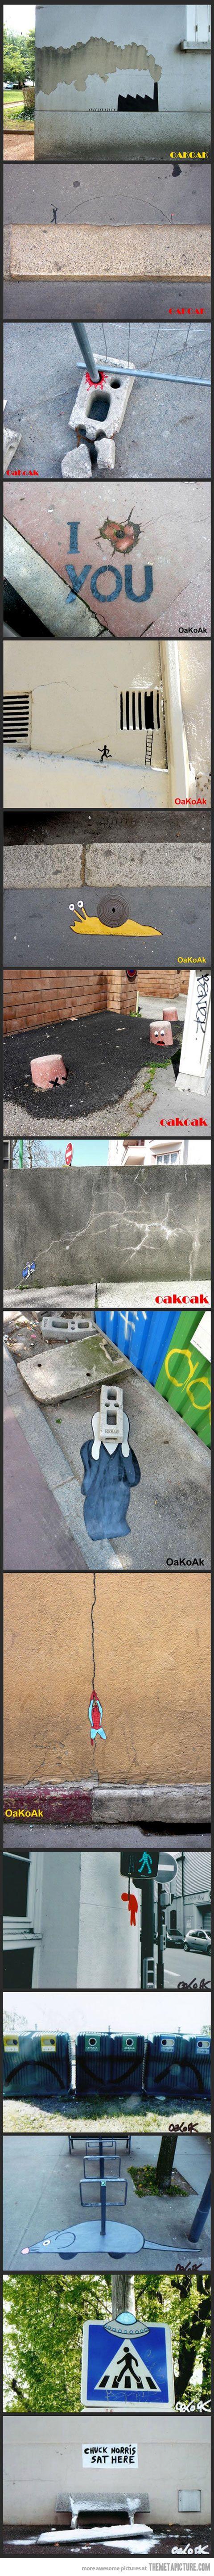 Urban summer and Urban Intervention  Interventions Street      chrome sunglasses Art   hearts Brilliant by cheap Art OakOak